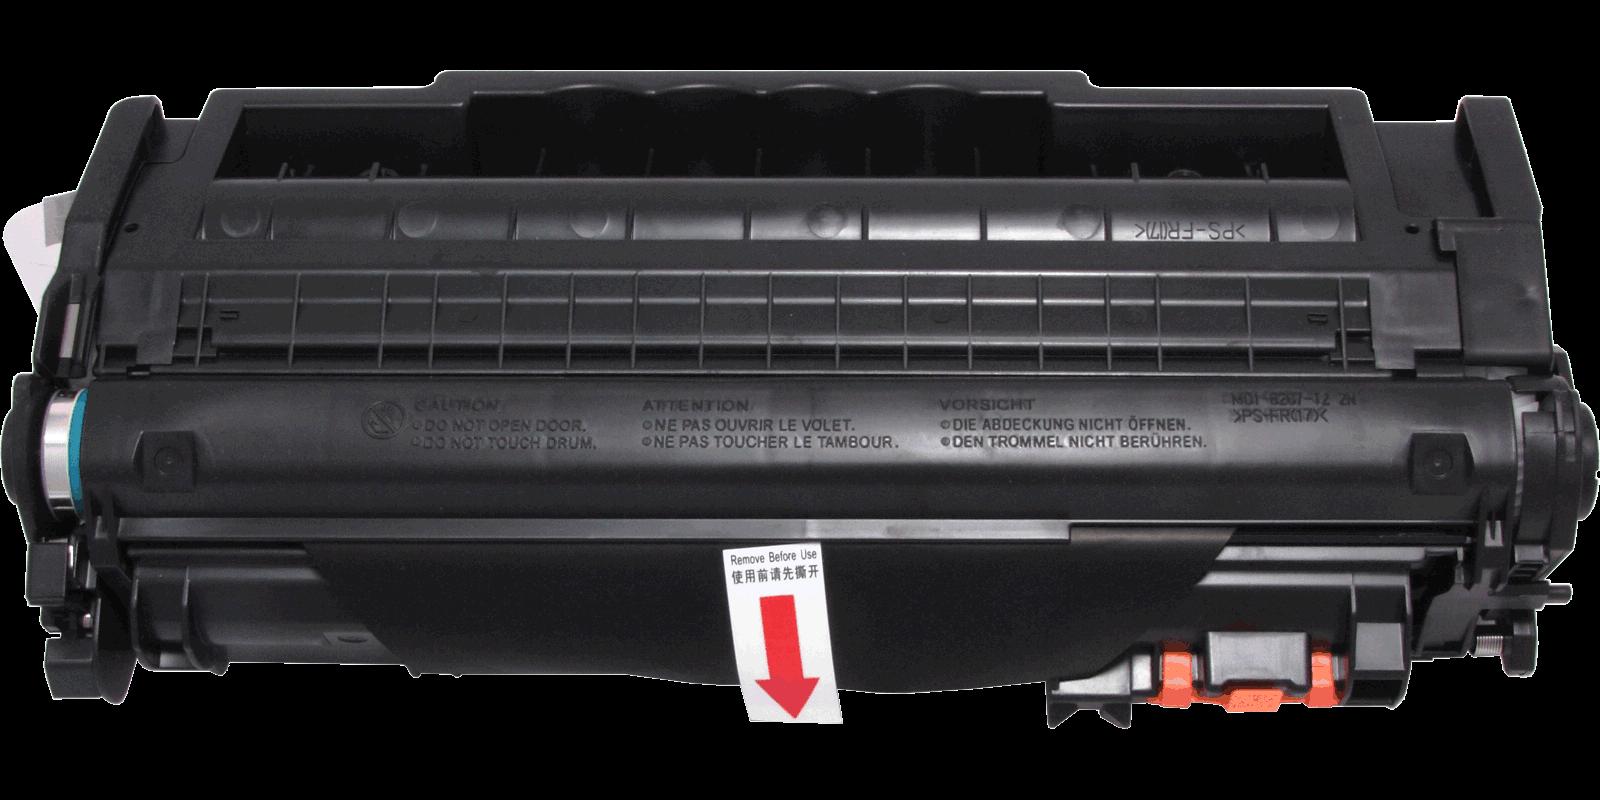 ЦРМ №49A/№53A UNIVERSAL Q7553A/Q5949A, черный, для HP, до 3000 стр.